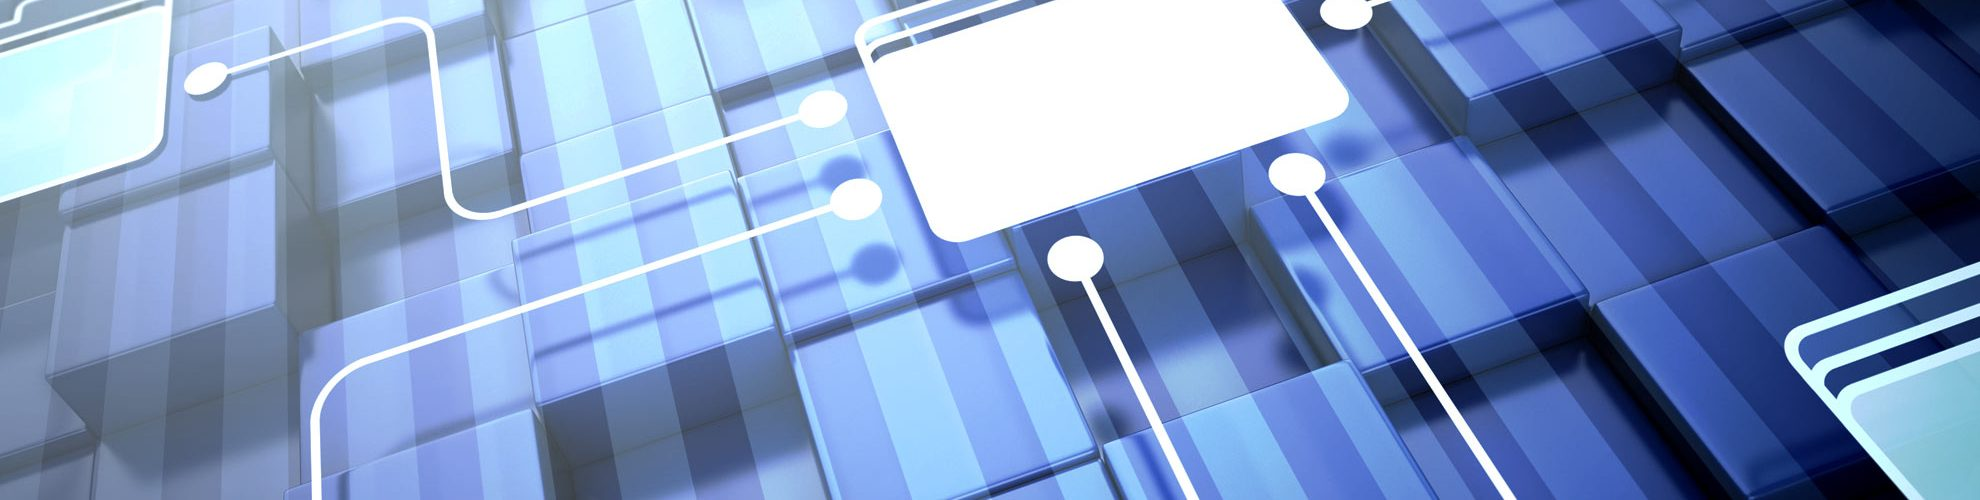 documenti-personale-paperless